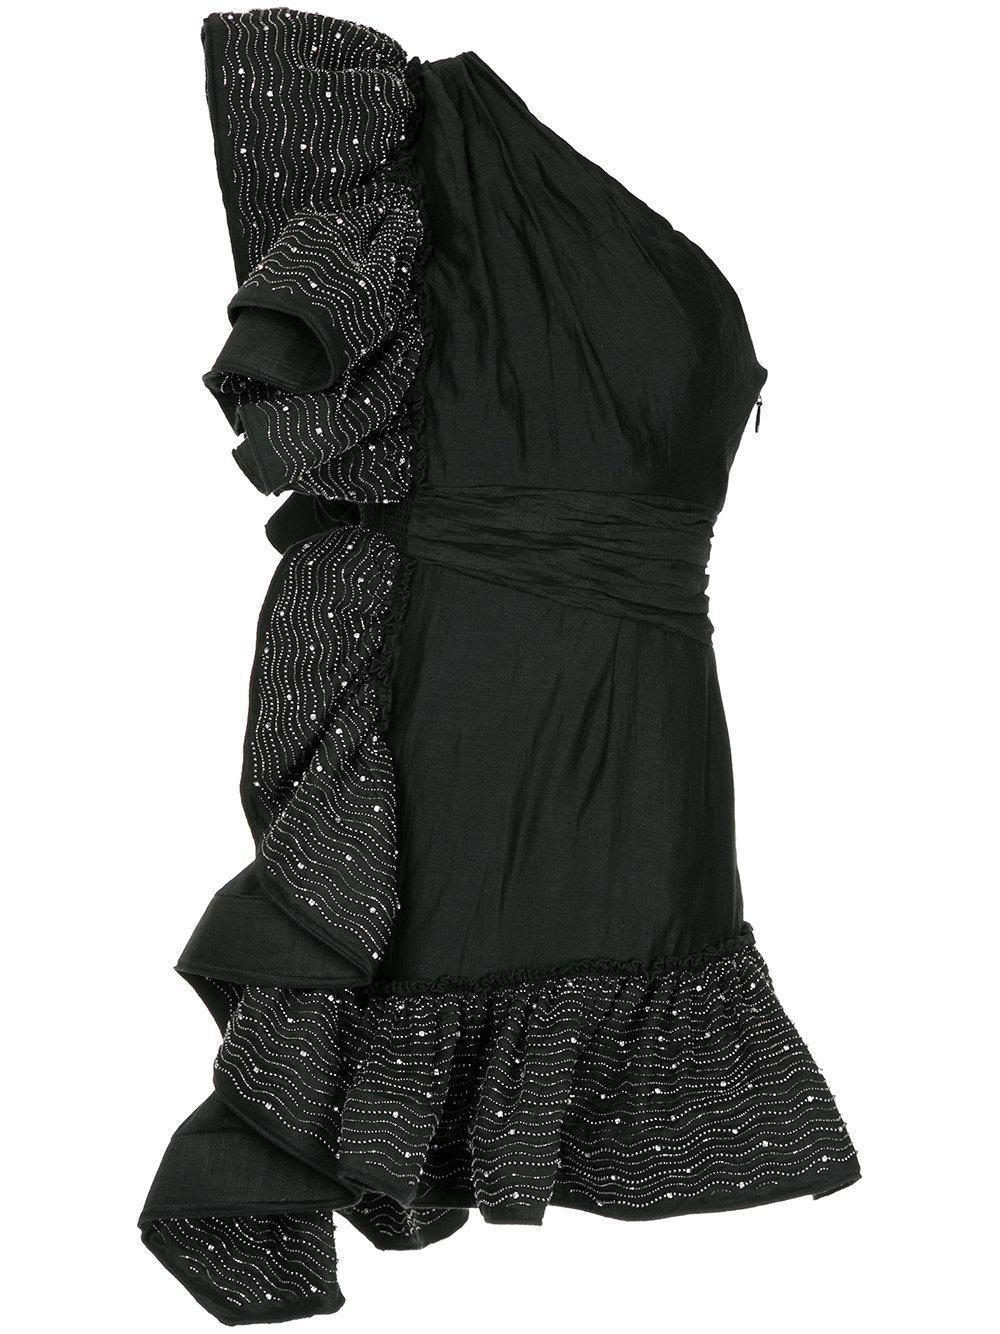 Aje Beronia Dress - Black